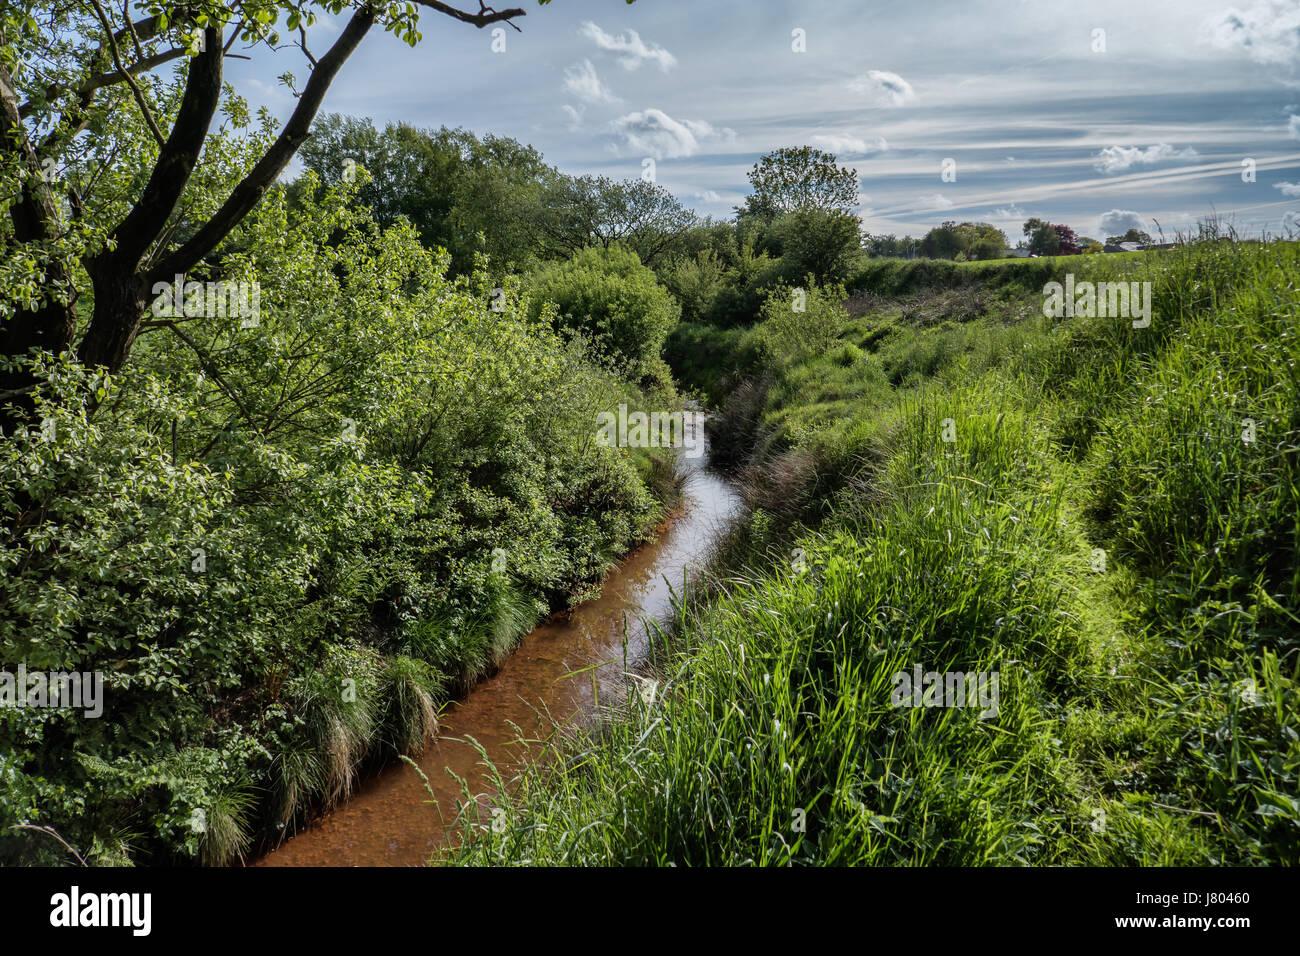 Ochre brook in wild nature, Vester Nebel, Jutland Denmark - Stock Image